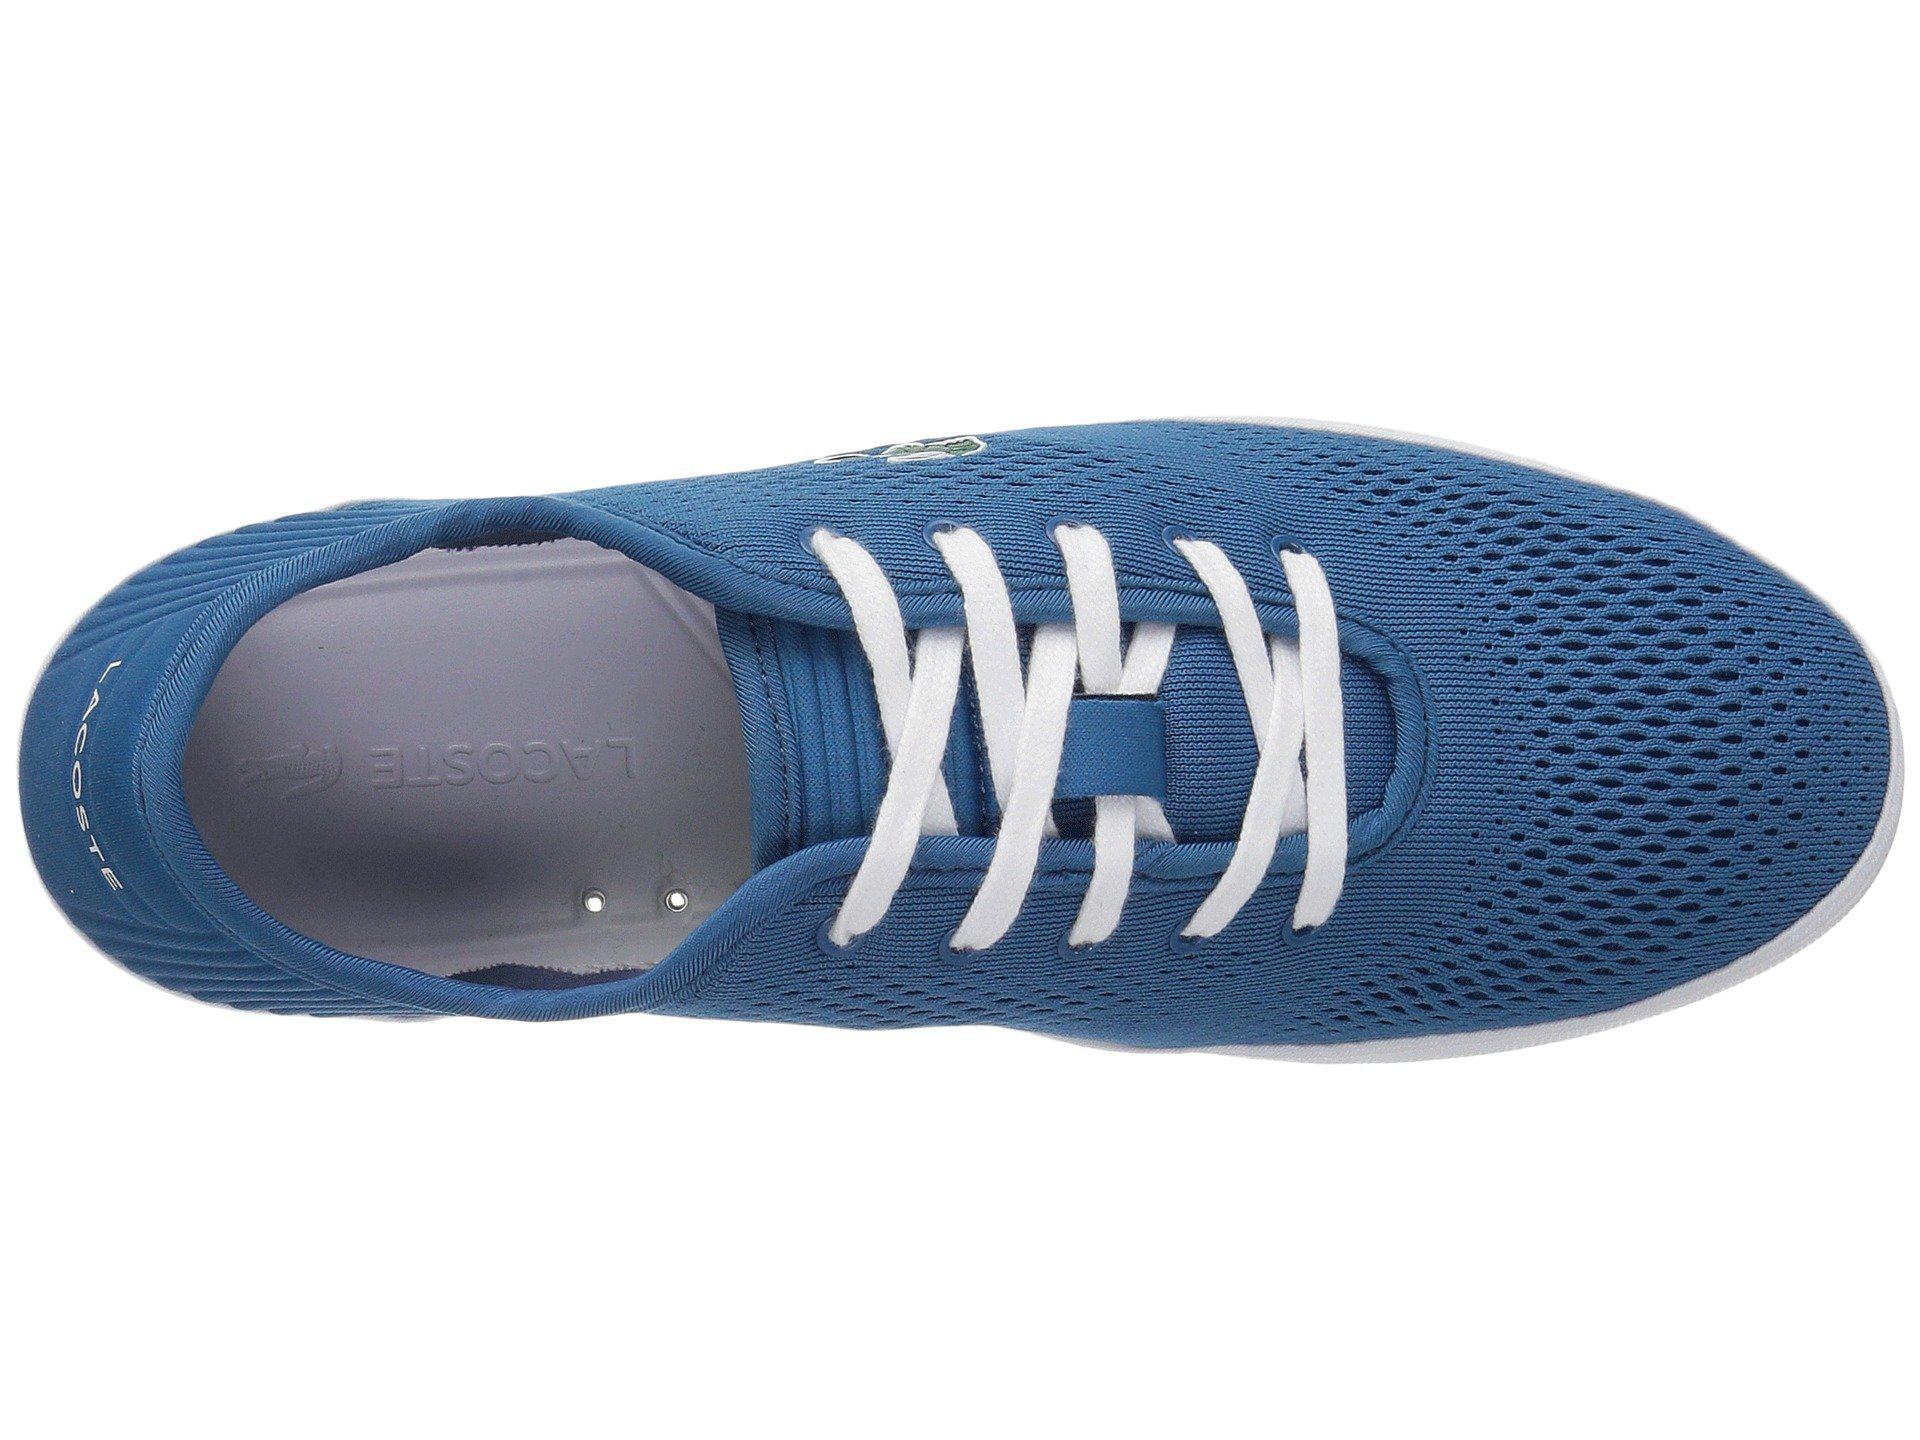 5fbc75d853ff0 Lacoste - L.ydro Lace 118 1 (dark Blue white) Men s Shoes. View fullscreen